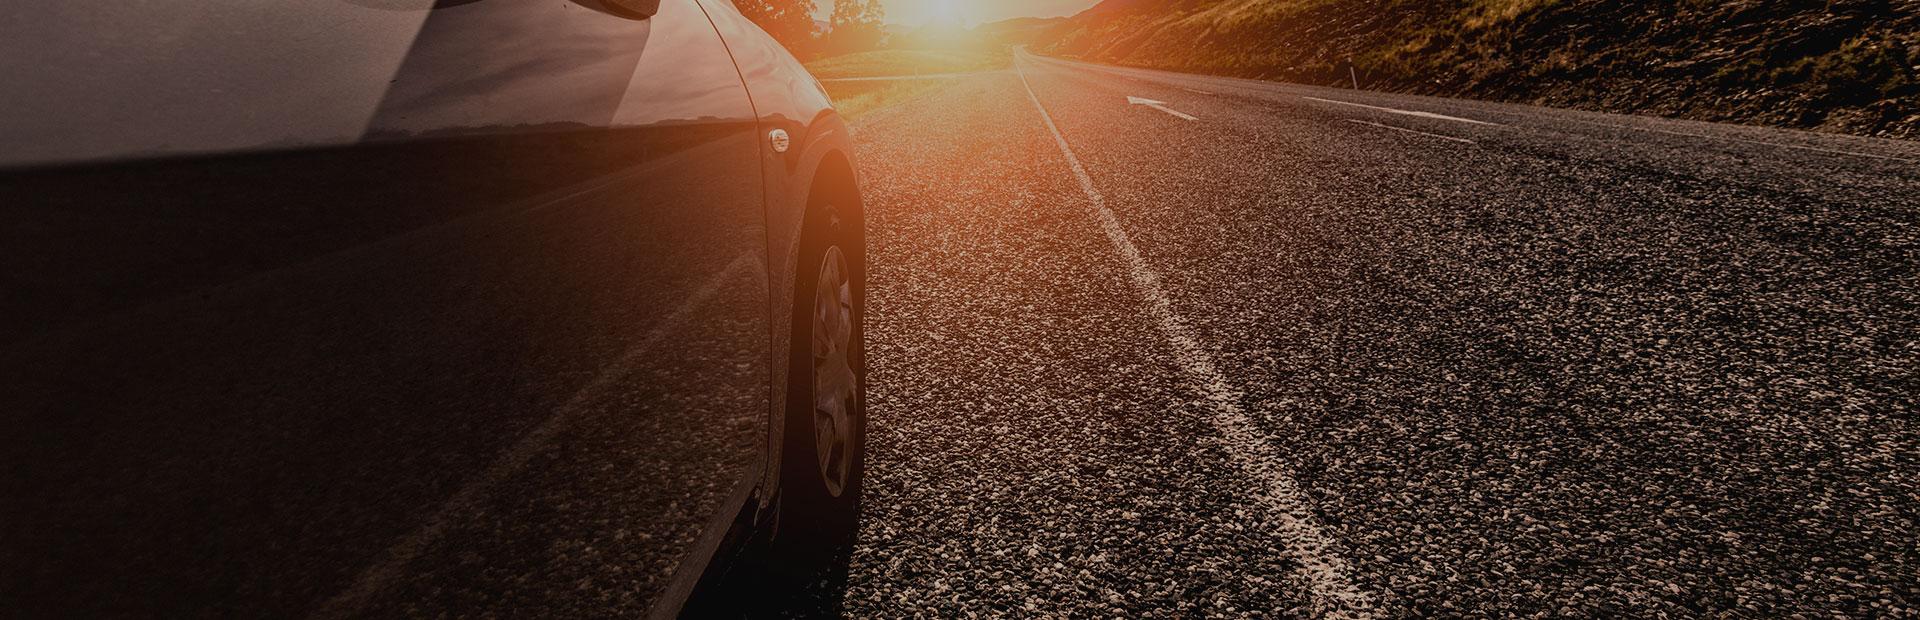 Auto Insurance - Global One Insurance Agency